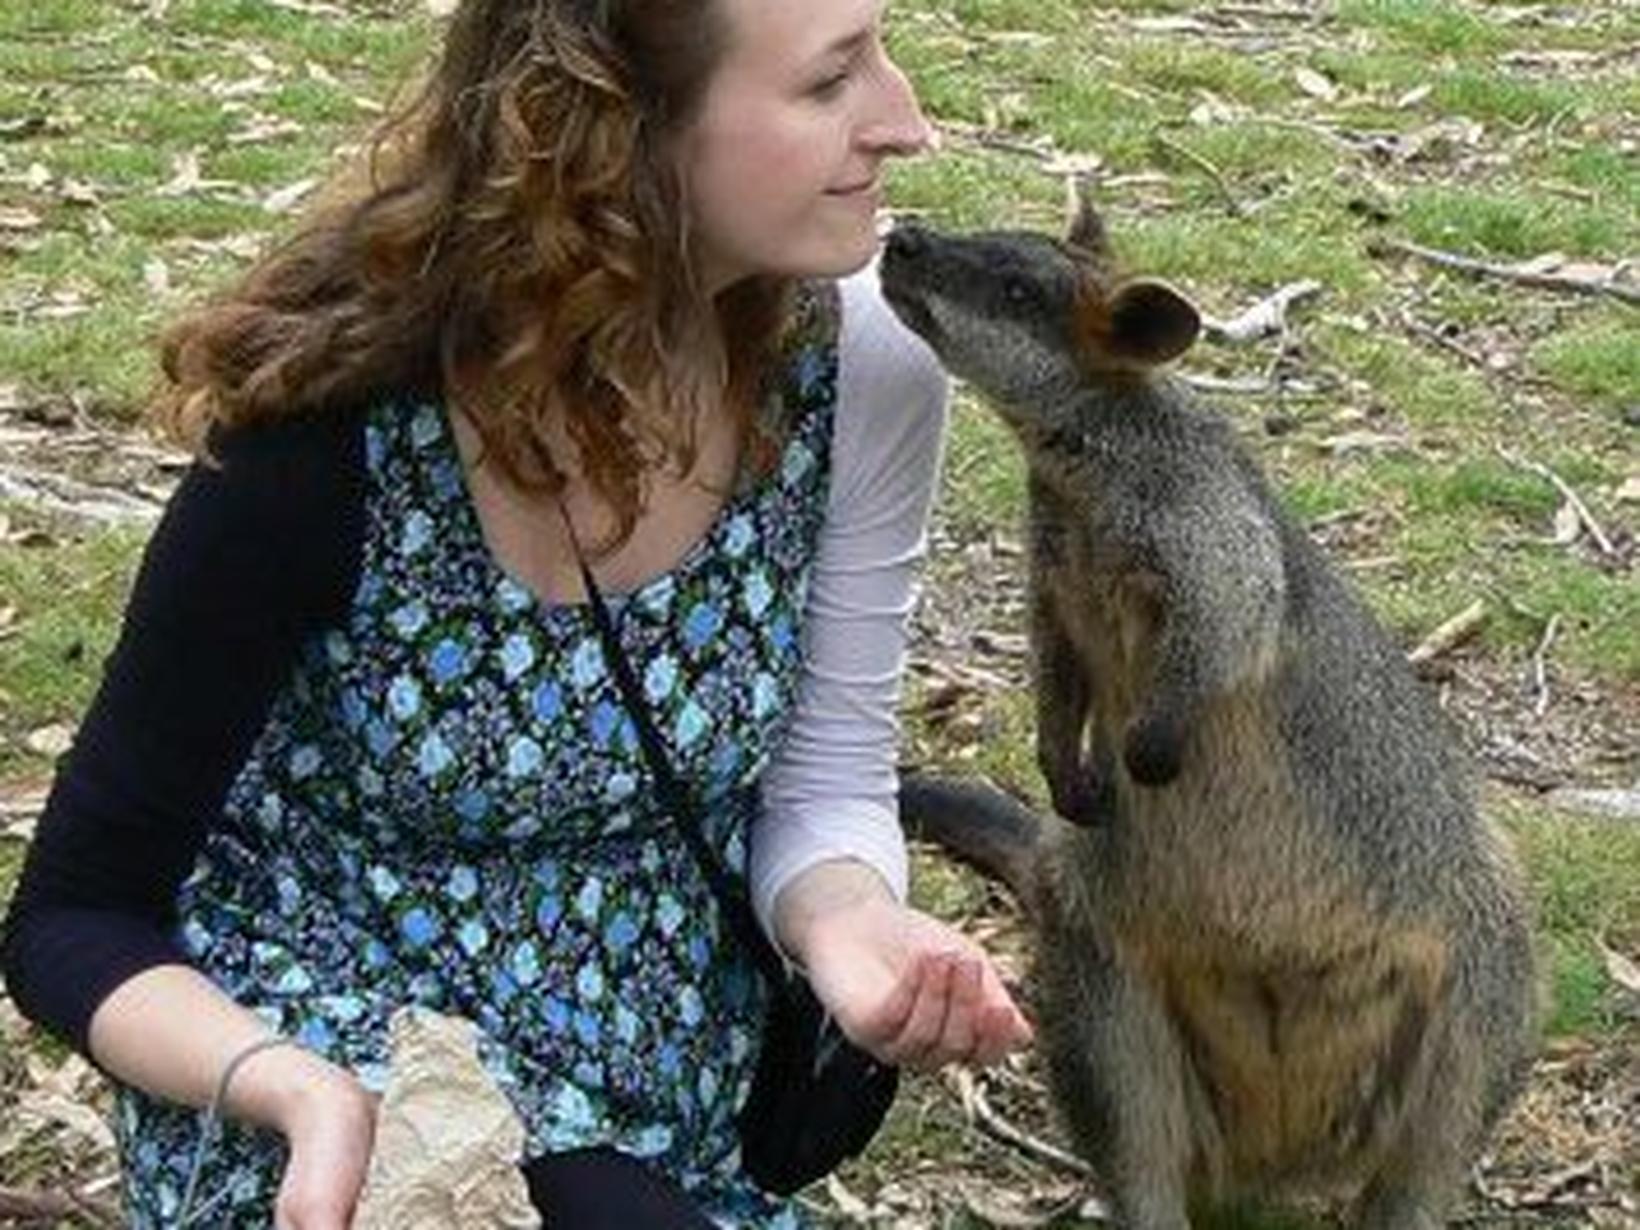 Agata from Sydney, New South Wales, Australia